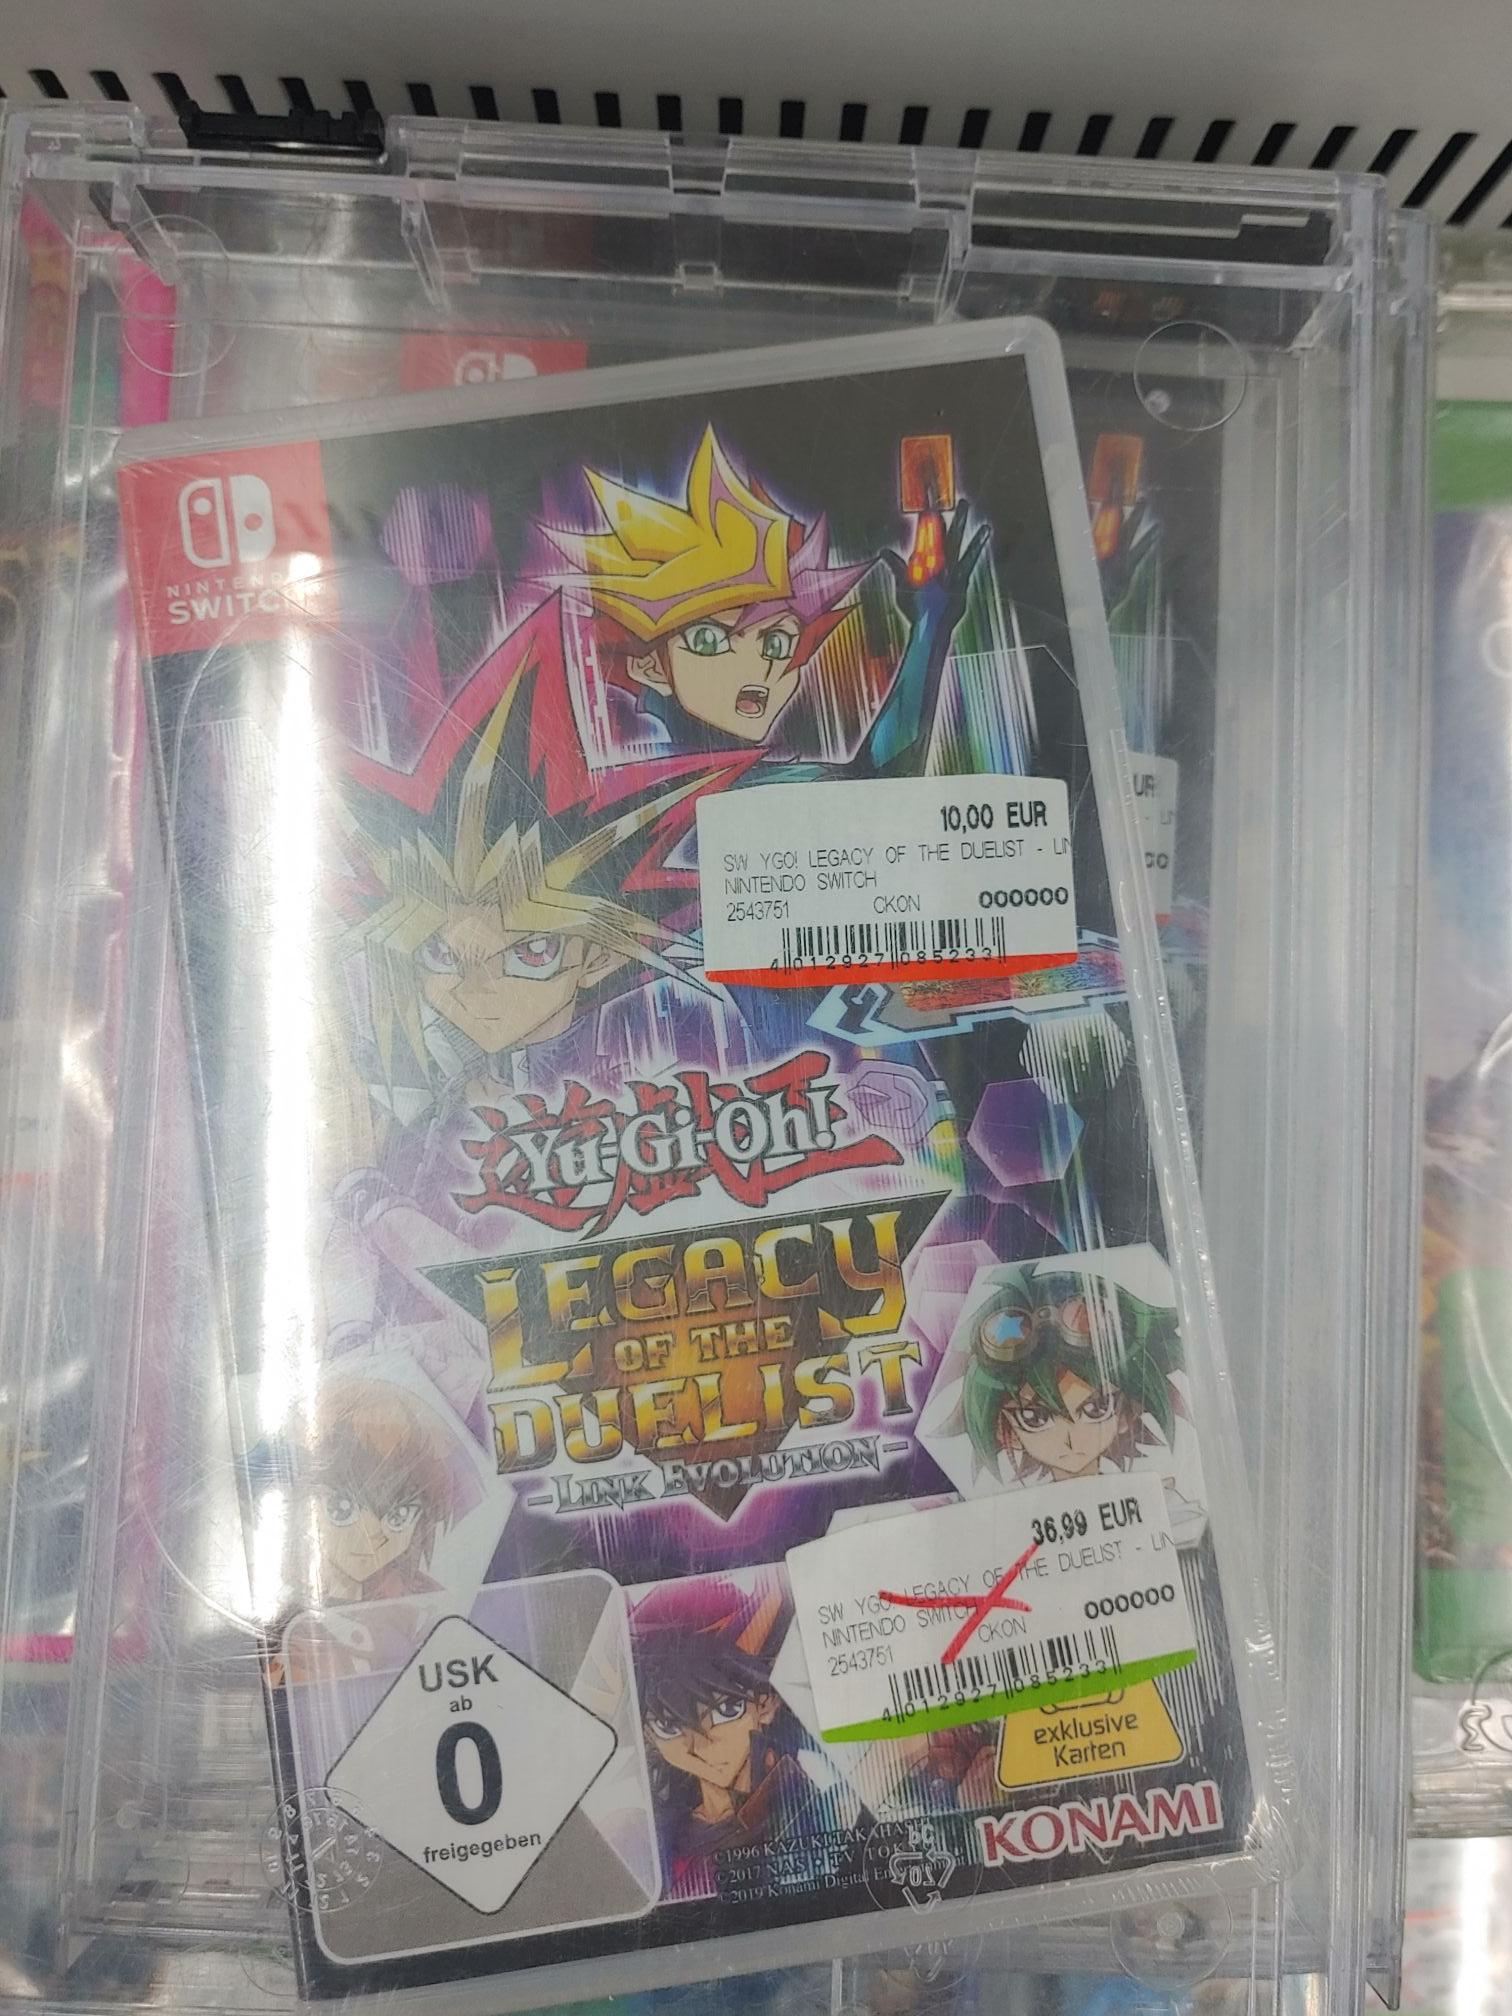 Lokal Media Markt Saarlouis Yu-Gi-Oh! Legacy of The Duelist: Link Evolution Nintendo Switch